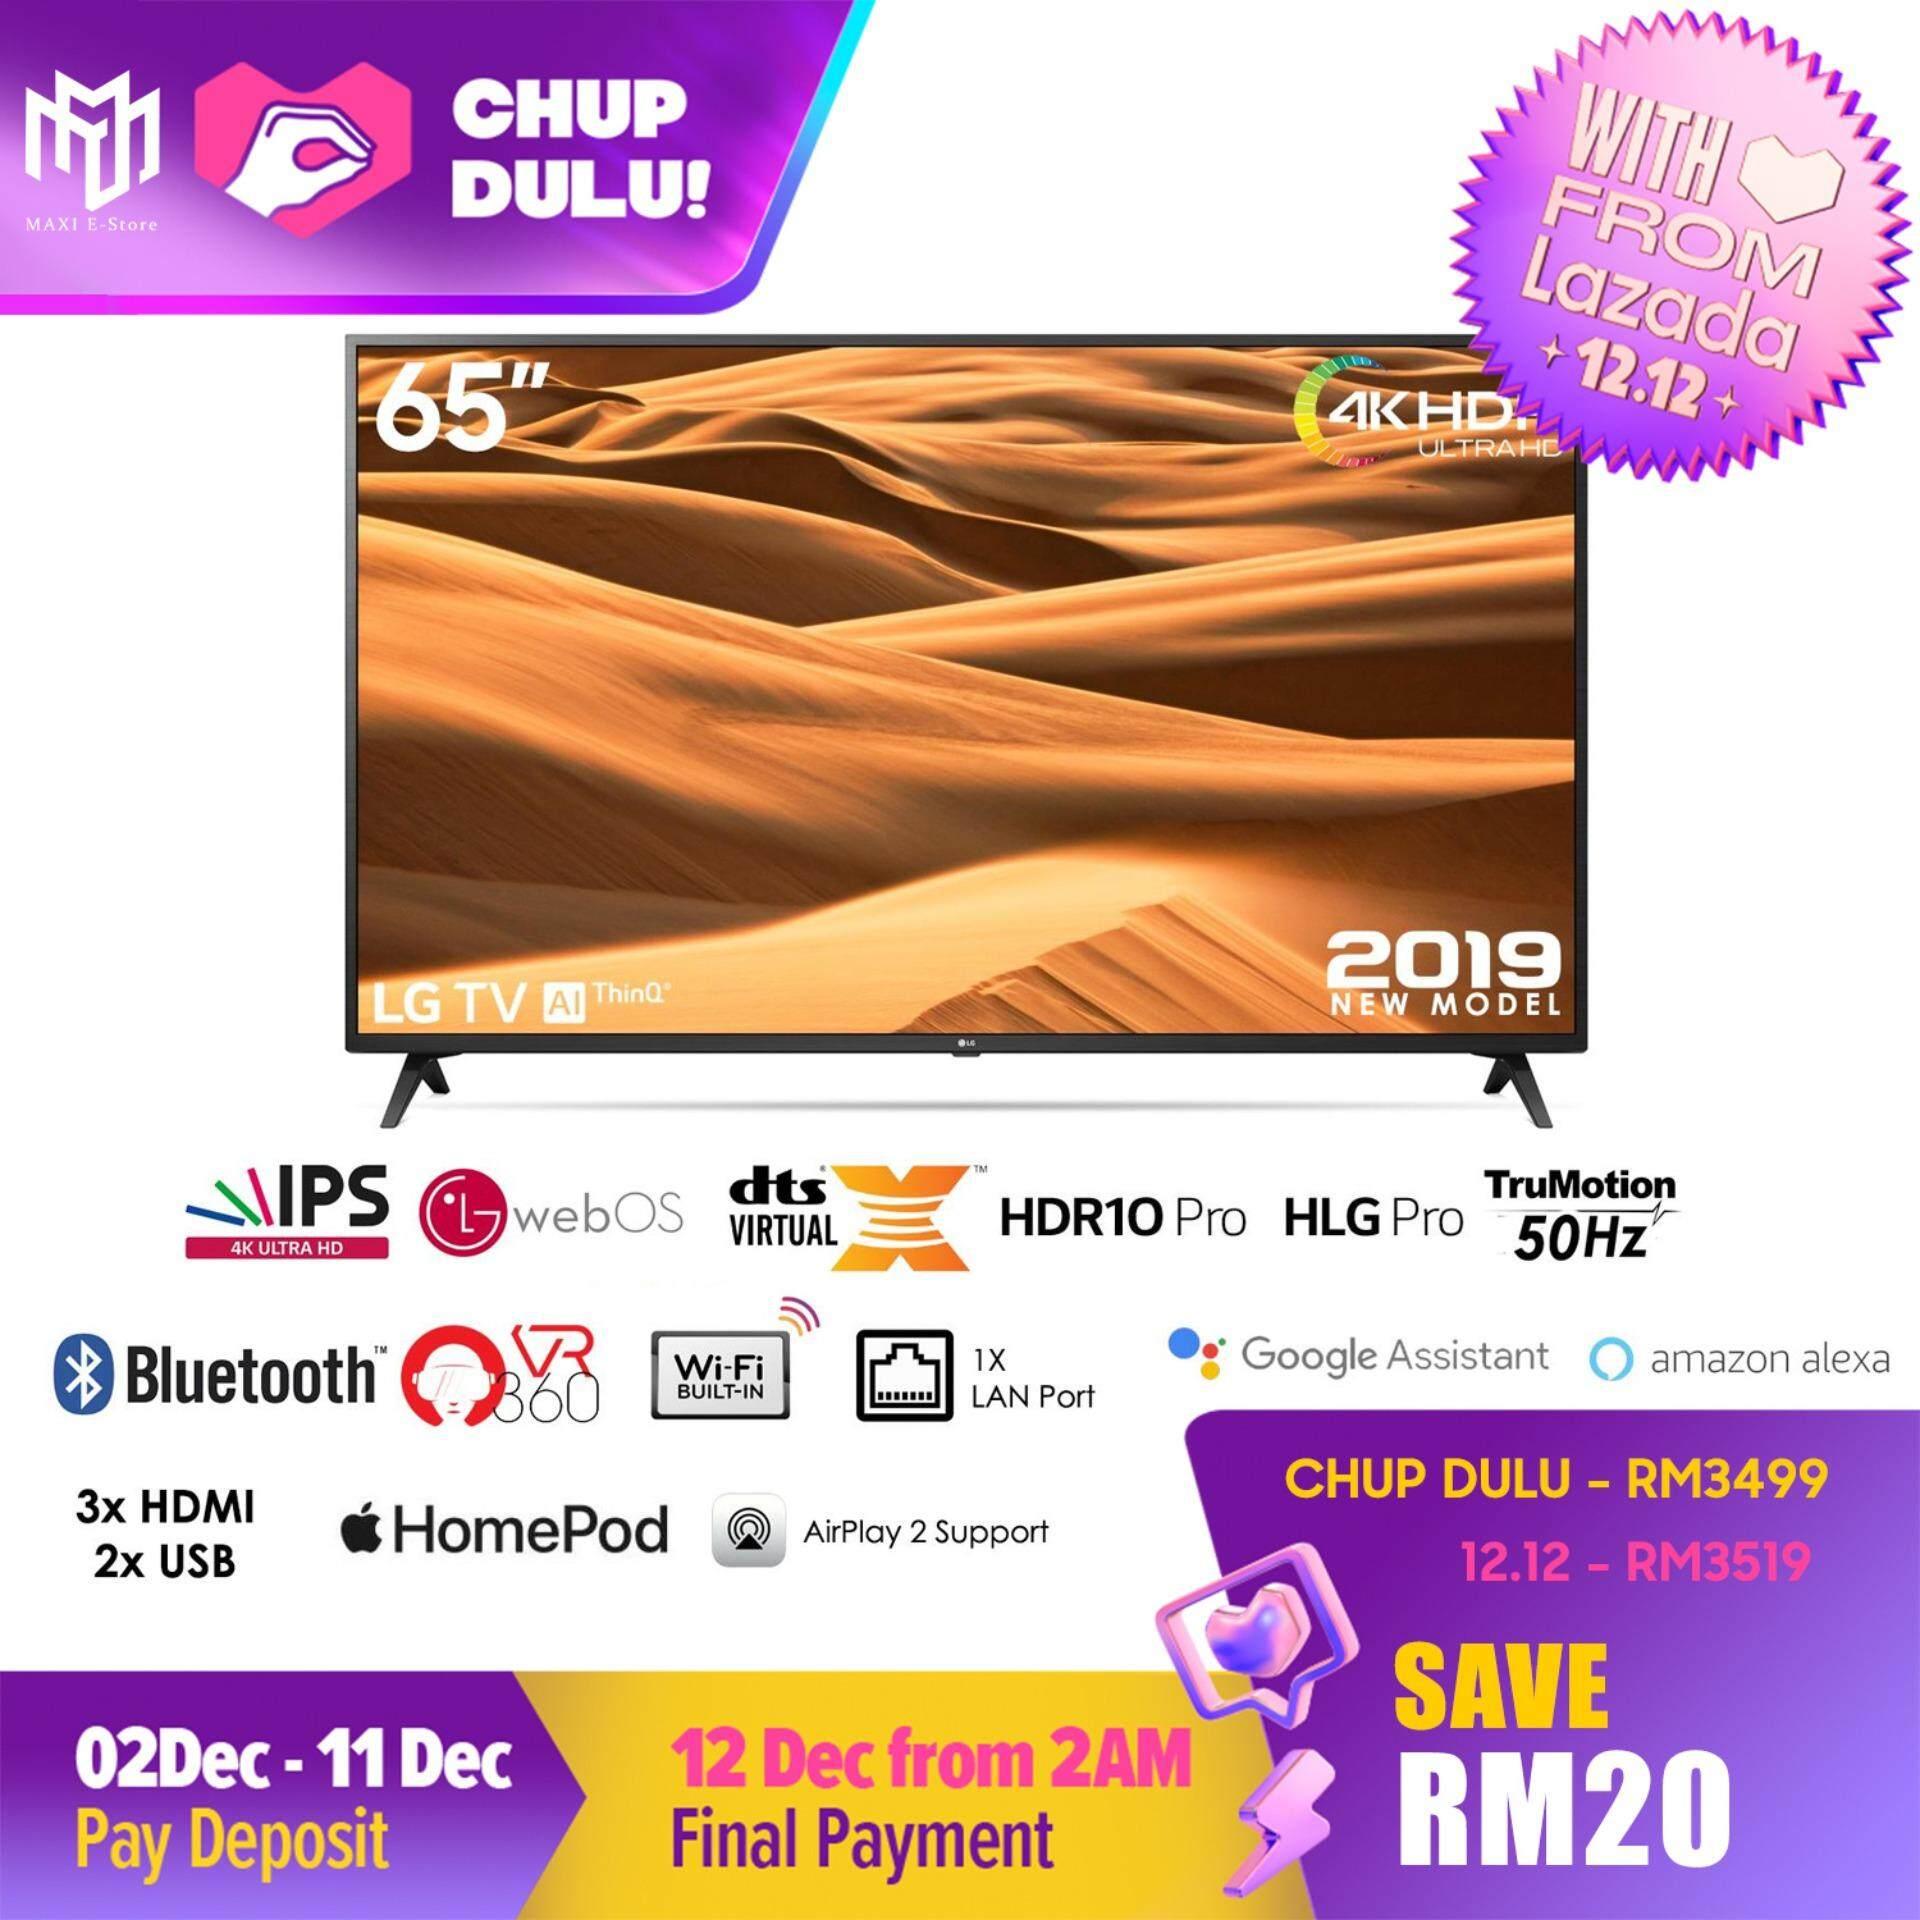 [12.12 CHUP DULU] LG 65UM7290PTD 65 inch UM72 Series HDR Smart UHD TV with AI ThinQ?